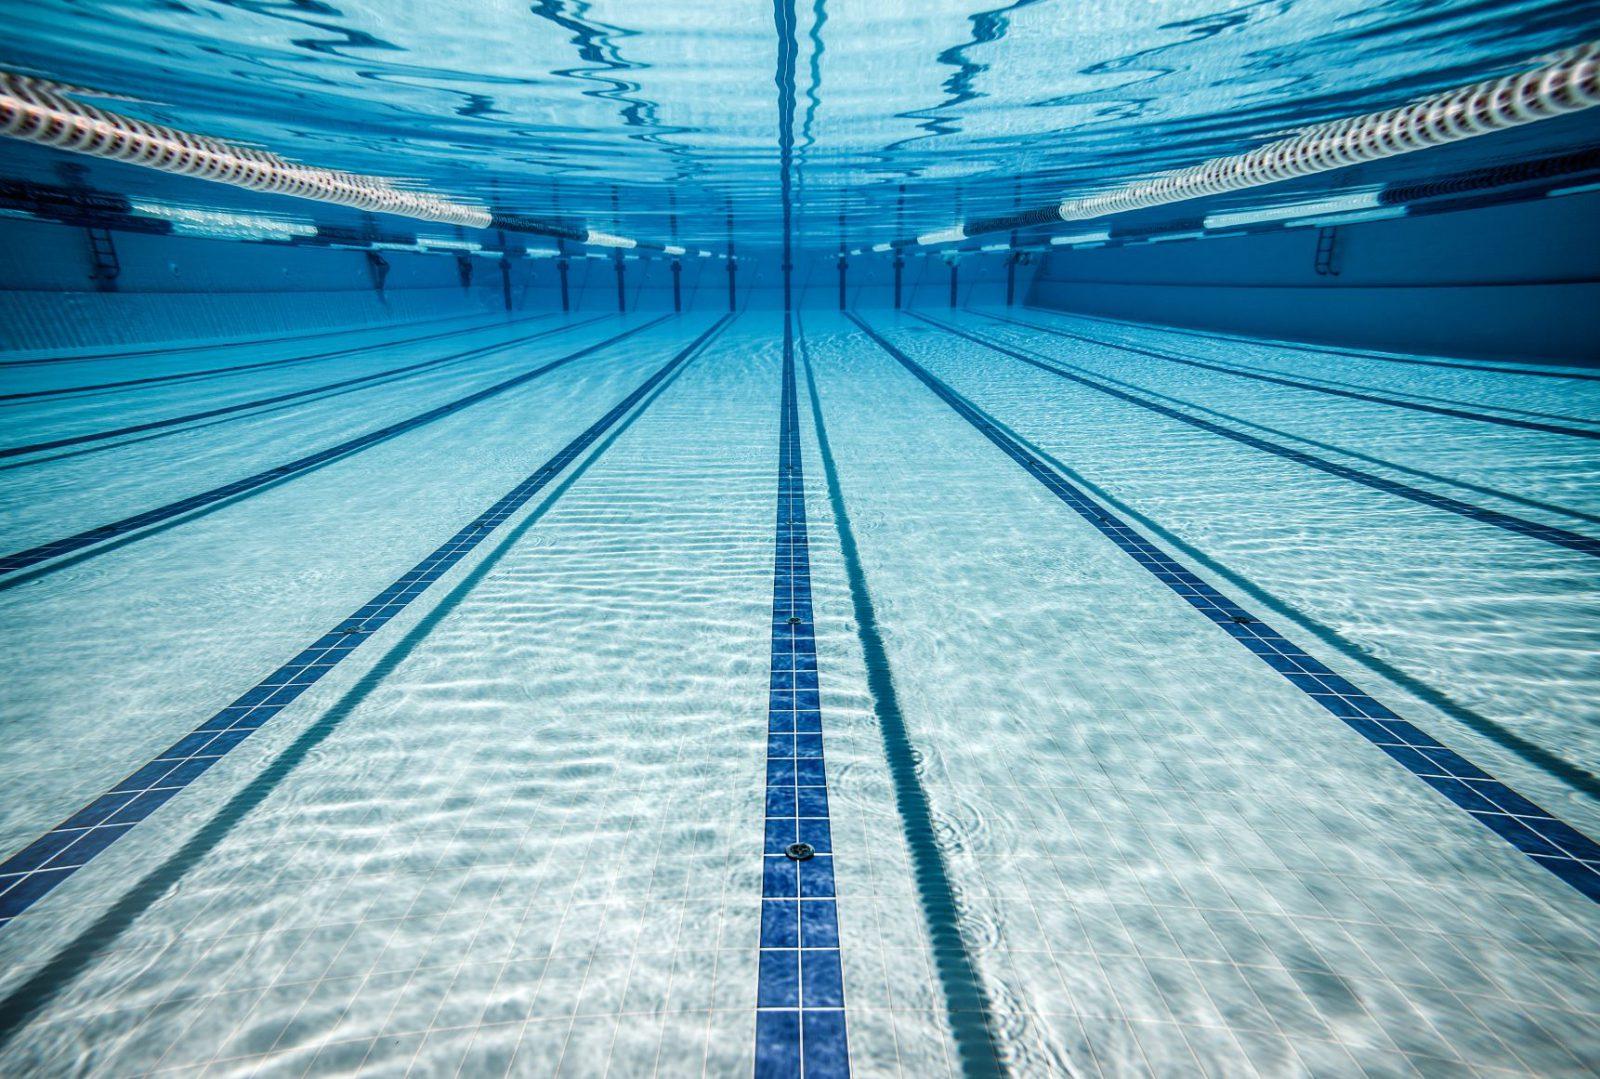 Cameron van der Burgh, pływanie koronawirus